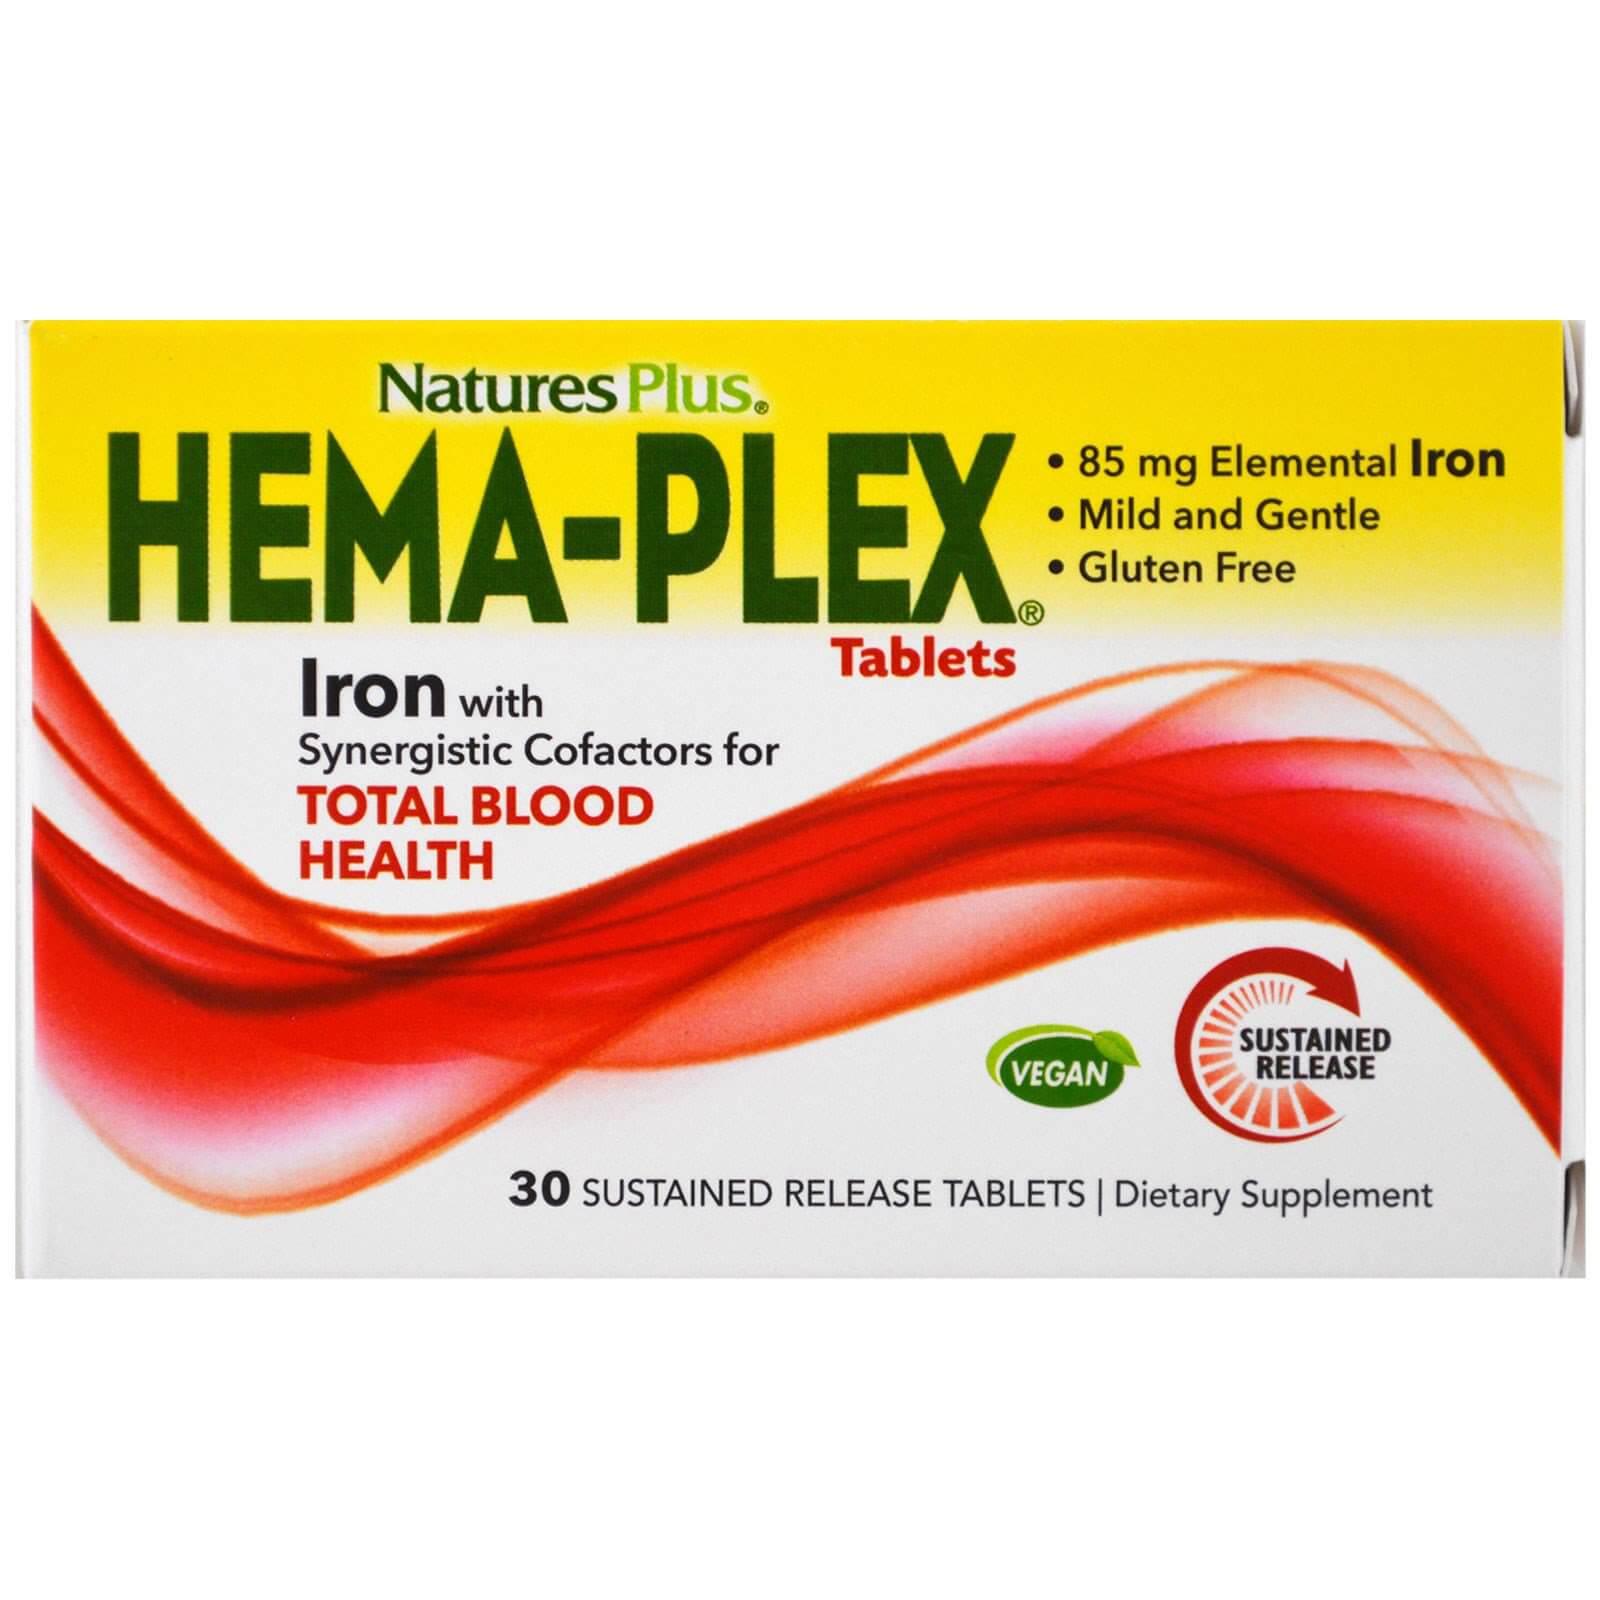 Natures Plus Hema-Plex Συμπλήρωμα Διατροφής με Εξαιρετική Φόρμουλα για τη Βελτίωση της Ποιότητας του Αίματος 30caps